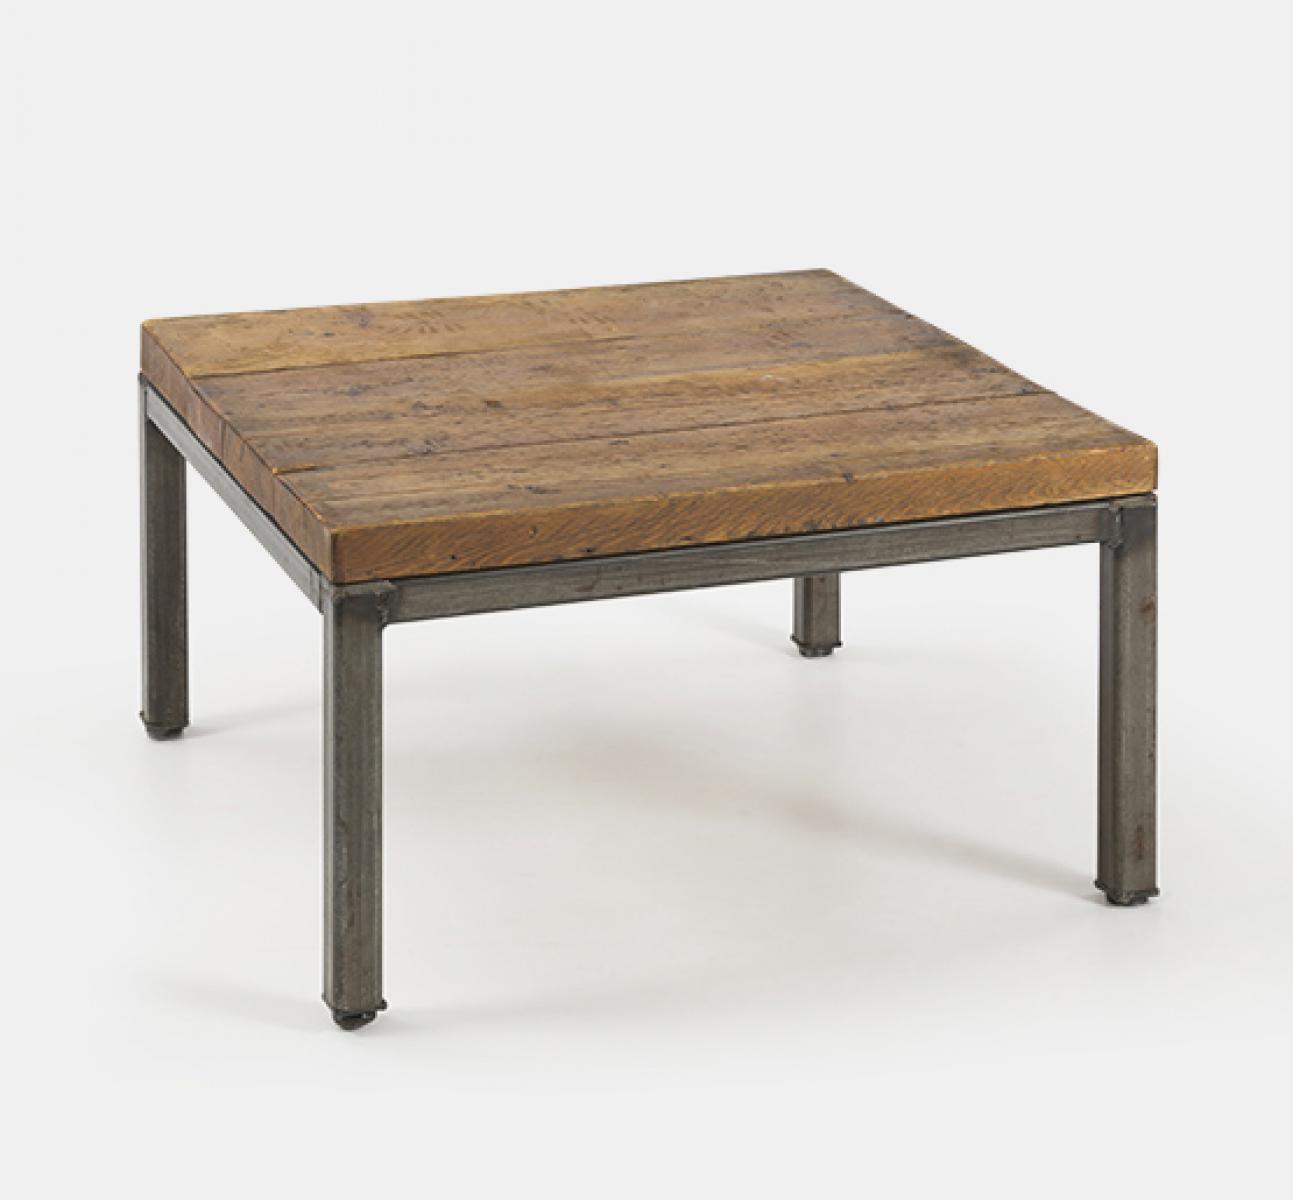 Quay Coffee table